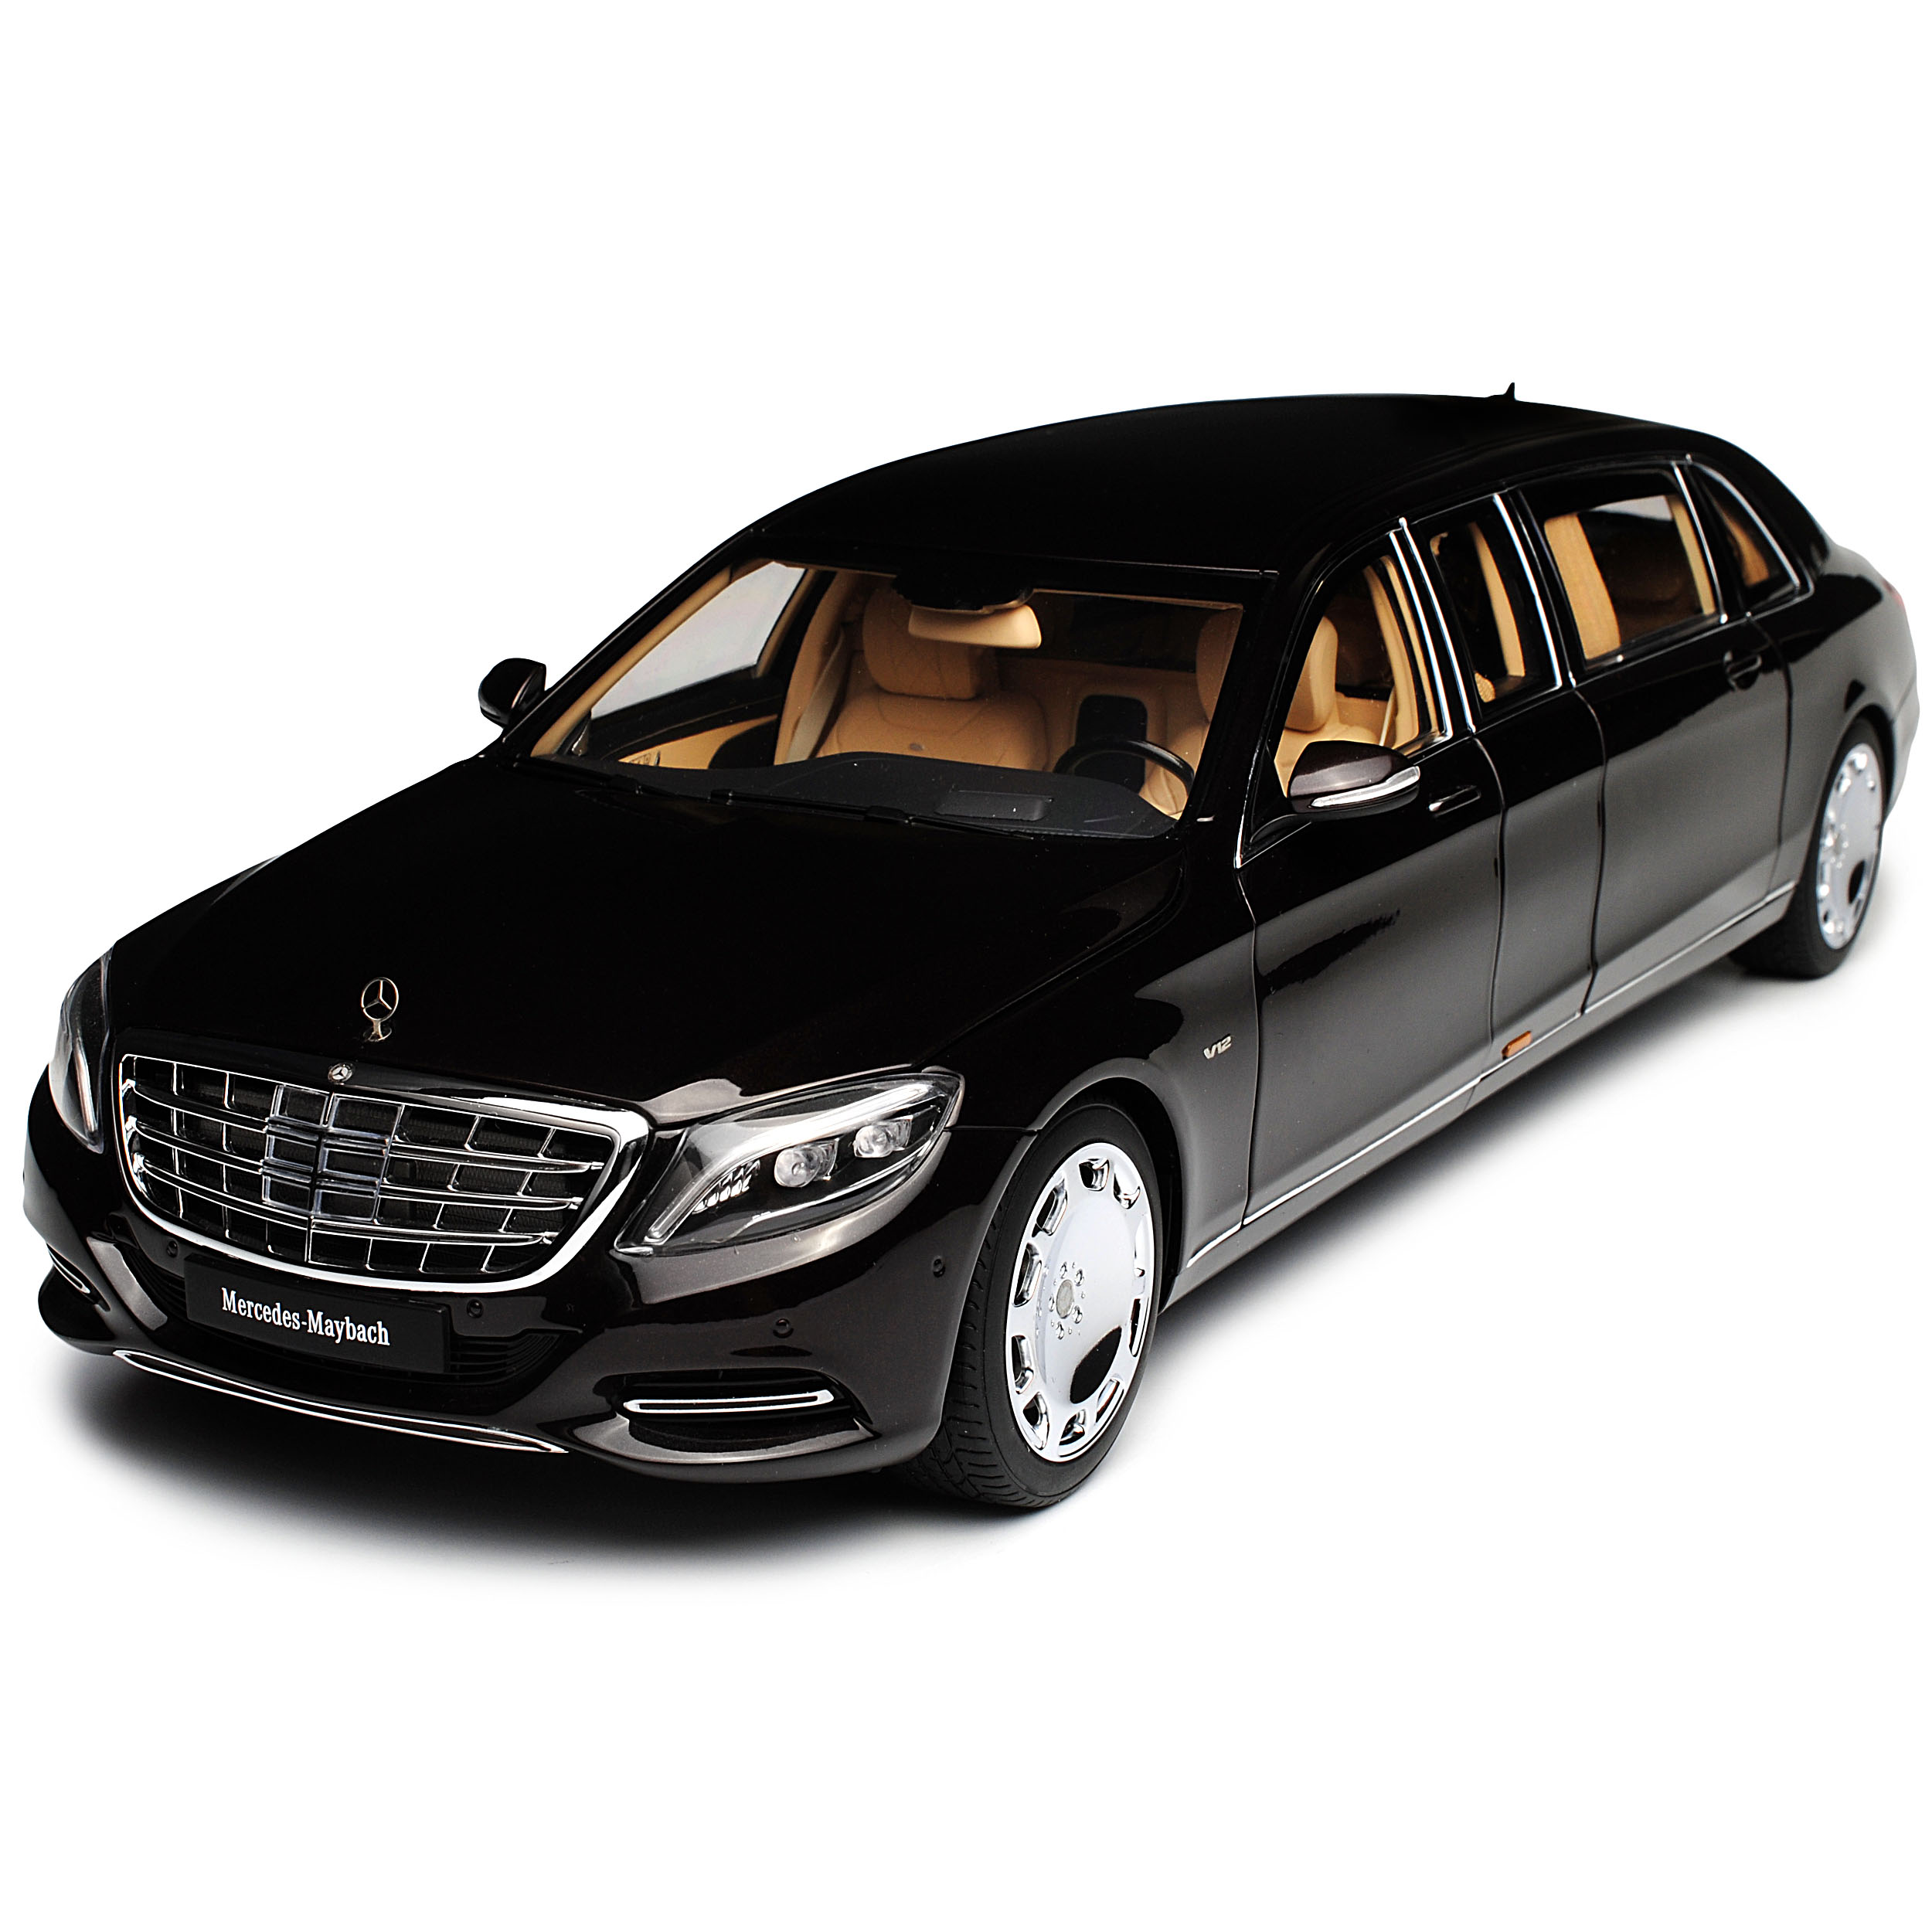 Mercedes-Benz Maybach Pullmann S-Klasse X222 S600 Stretch